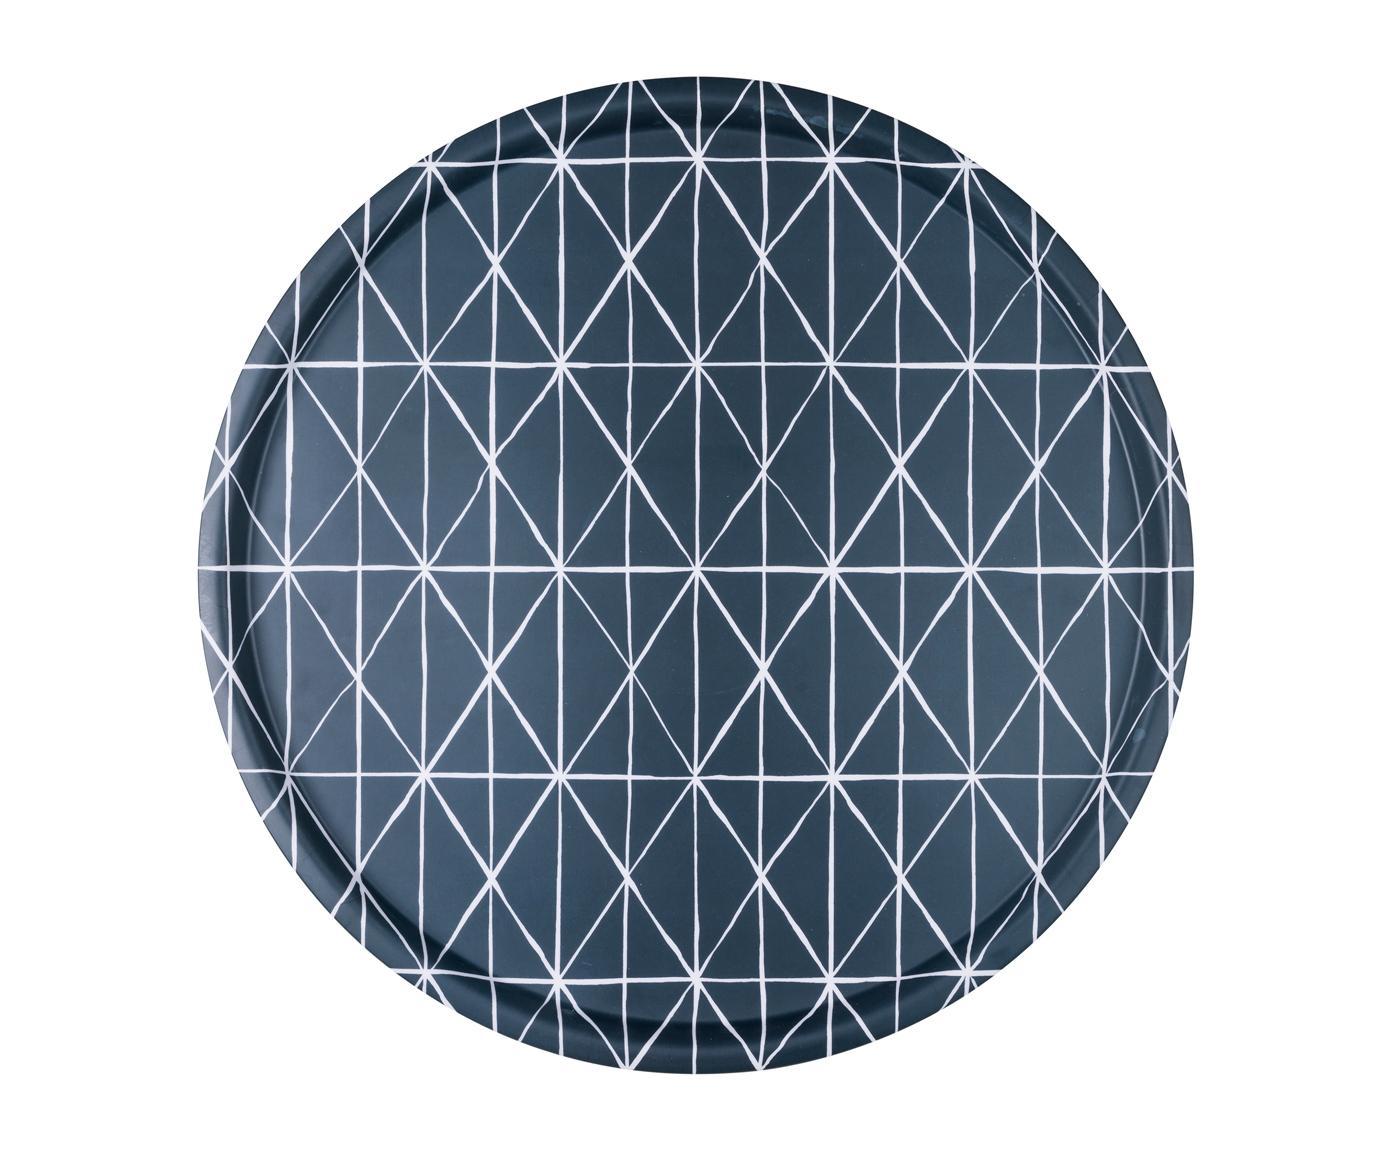 Vassoio Ystad rotondo in blu / bianco, Melamina, Blu, bianco, Ø 41 cm